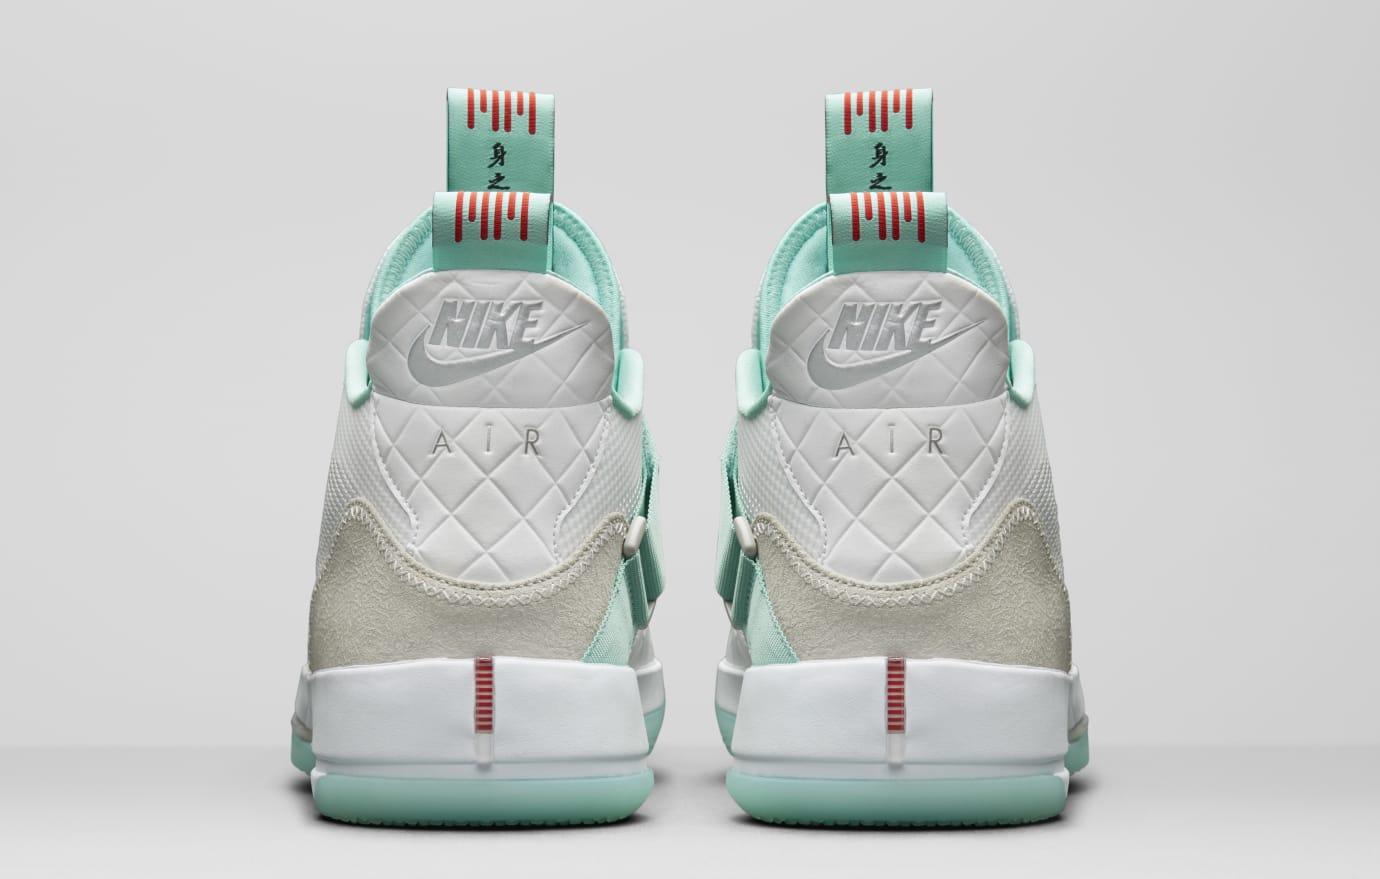 c0a131de8f1a68 Image via Nike Air Jordan 33 Guo Ailun PE AQ8830-101 (Heel)